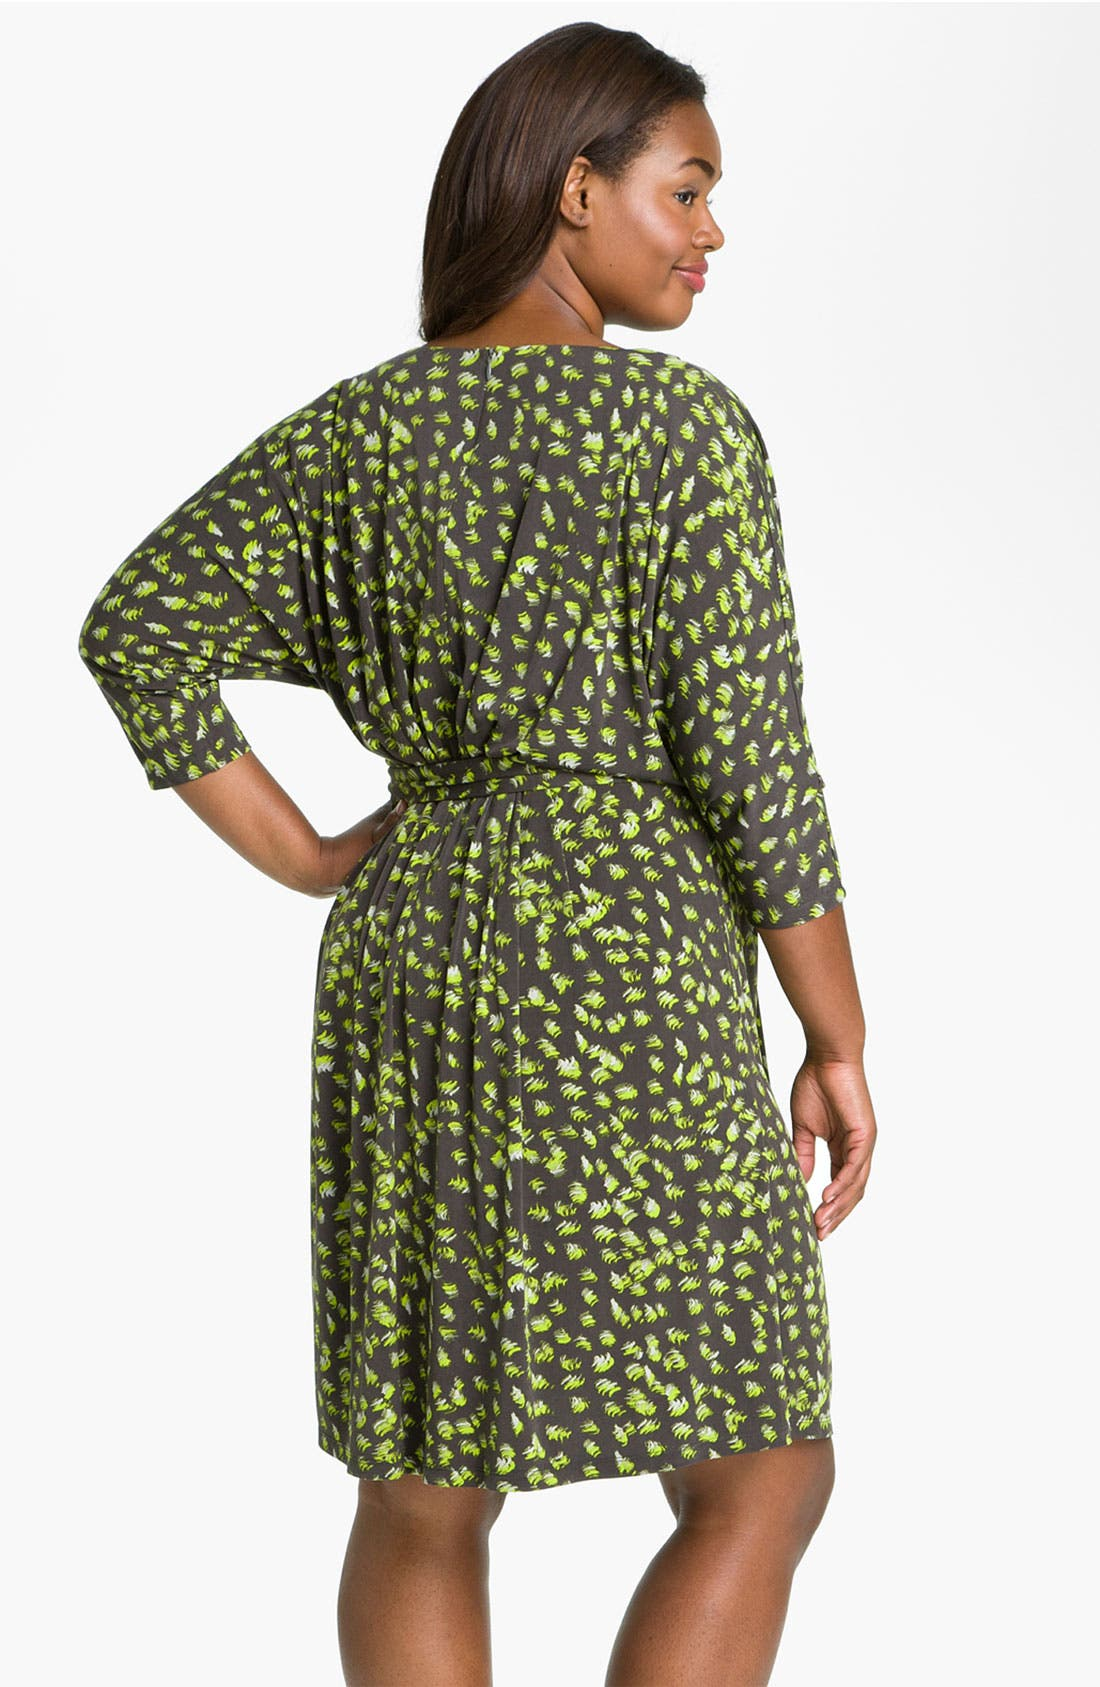 Alternate Image 2  - Suzi Chin for Maggy Boutique Tie Front Print Dress (Plus)